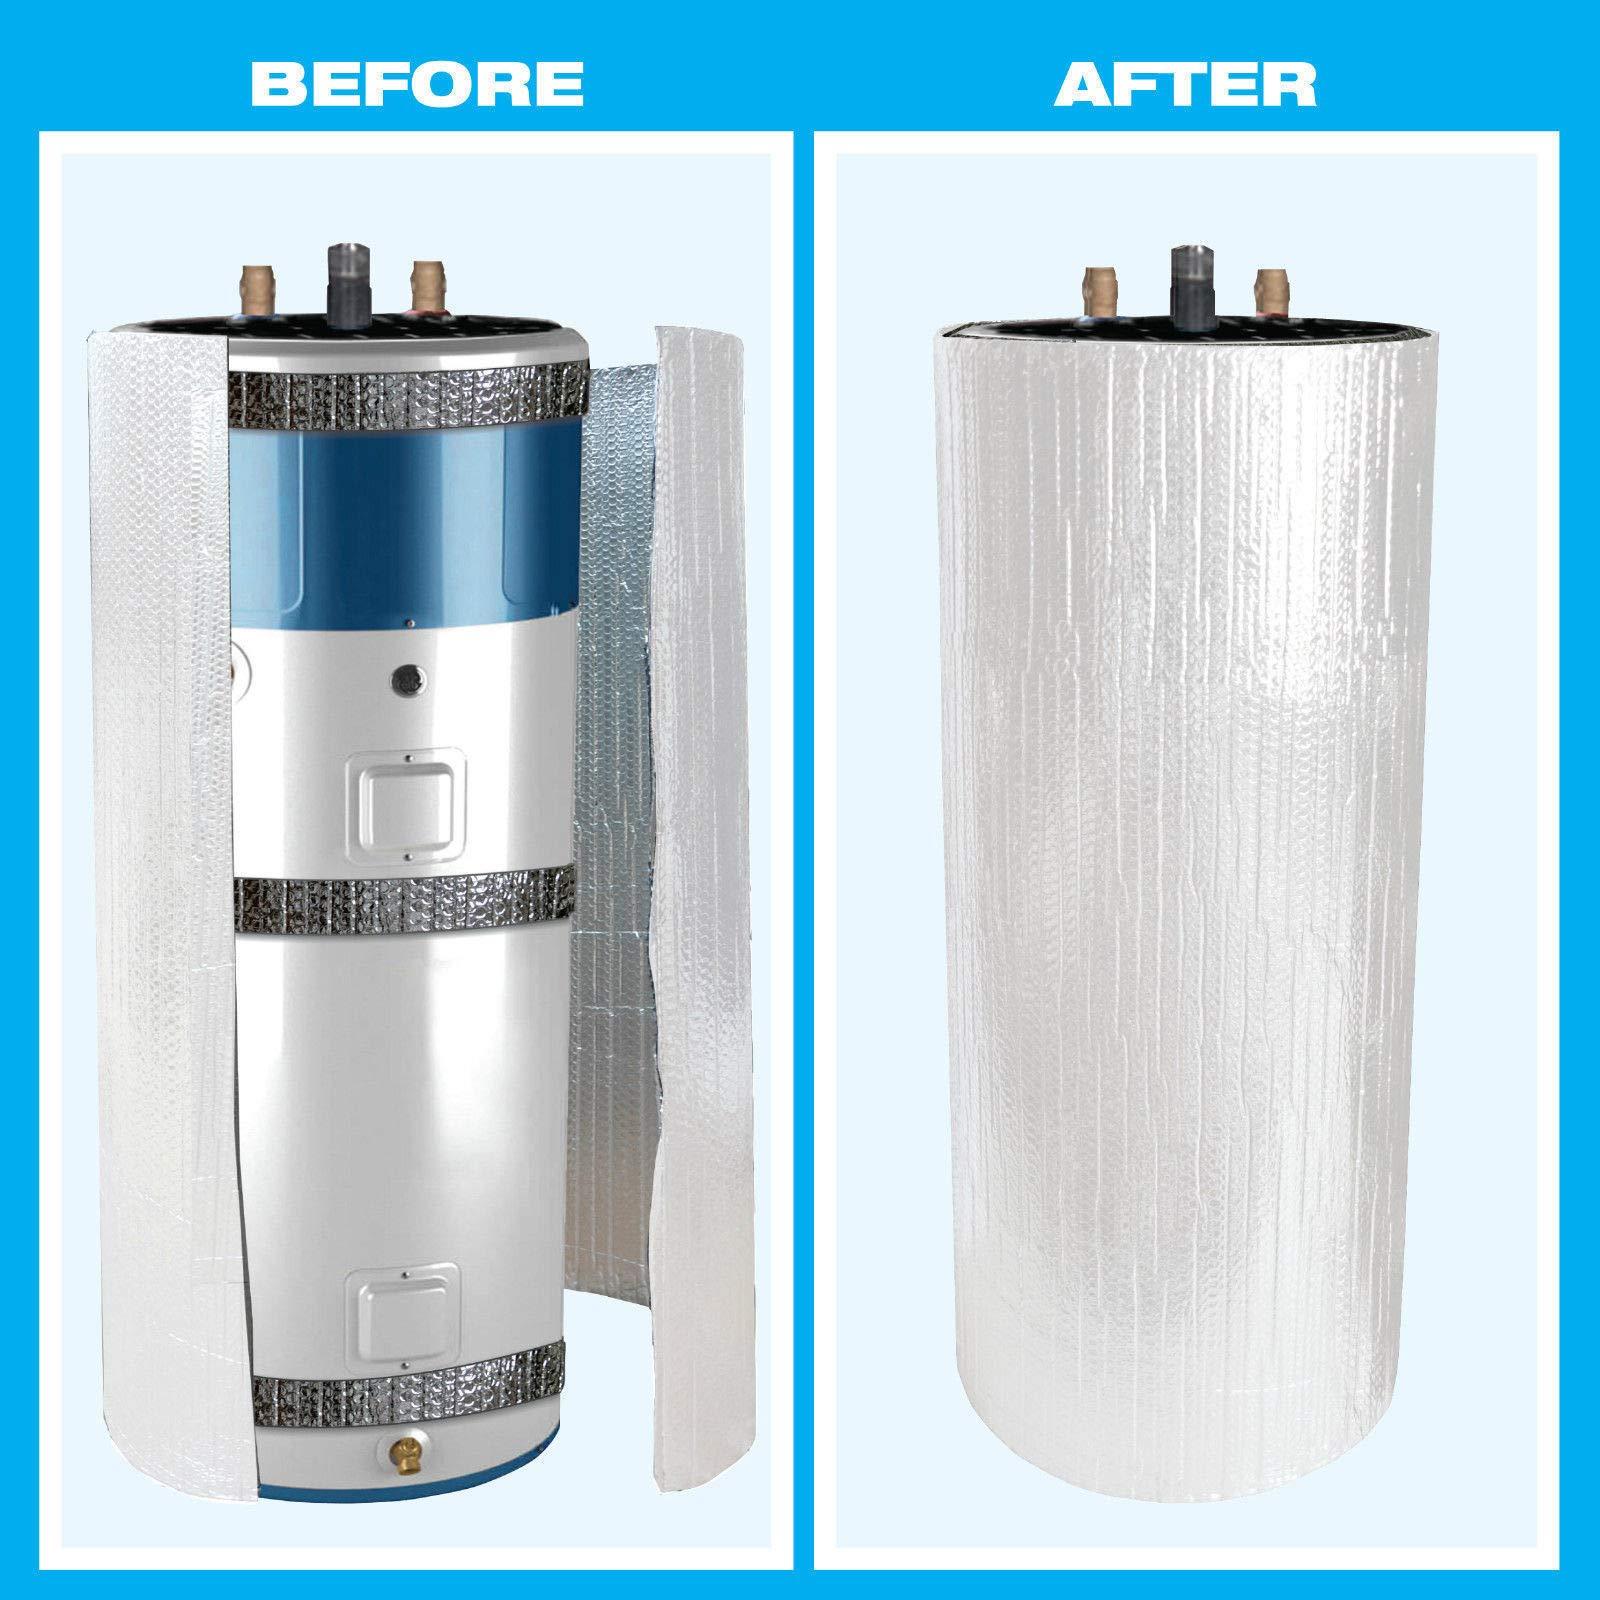 2 Car Garage Door Insulation Kit R 7.5 Fits 16x7 & 16x8 + Water Heater Jacket 60